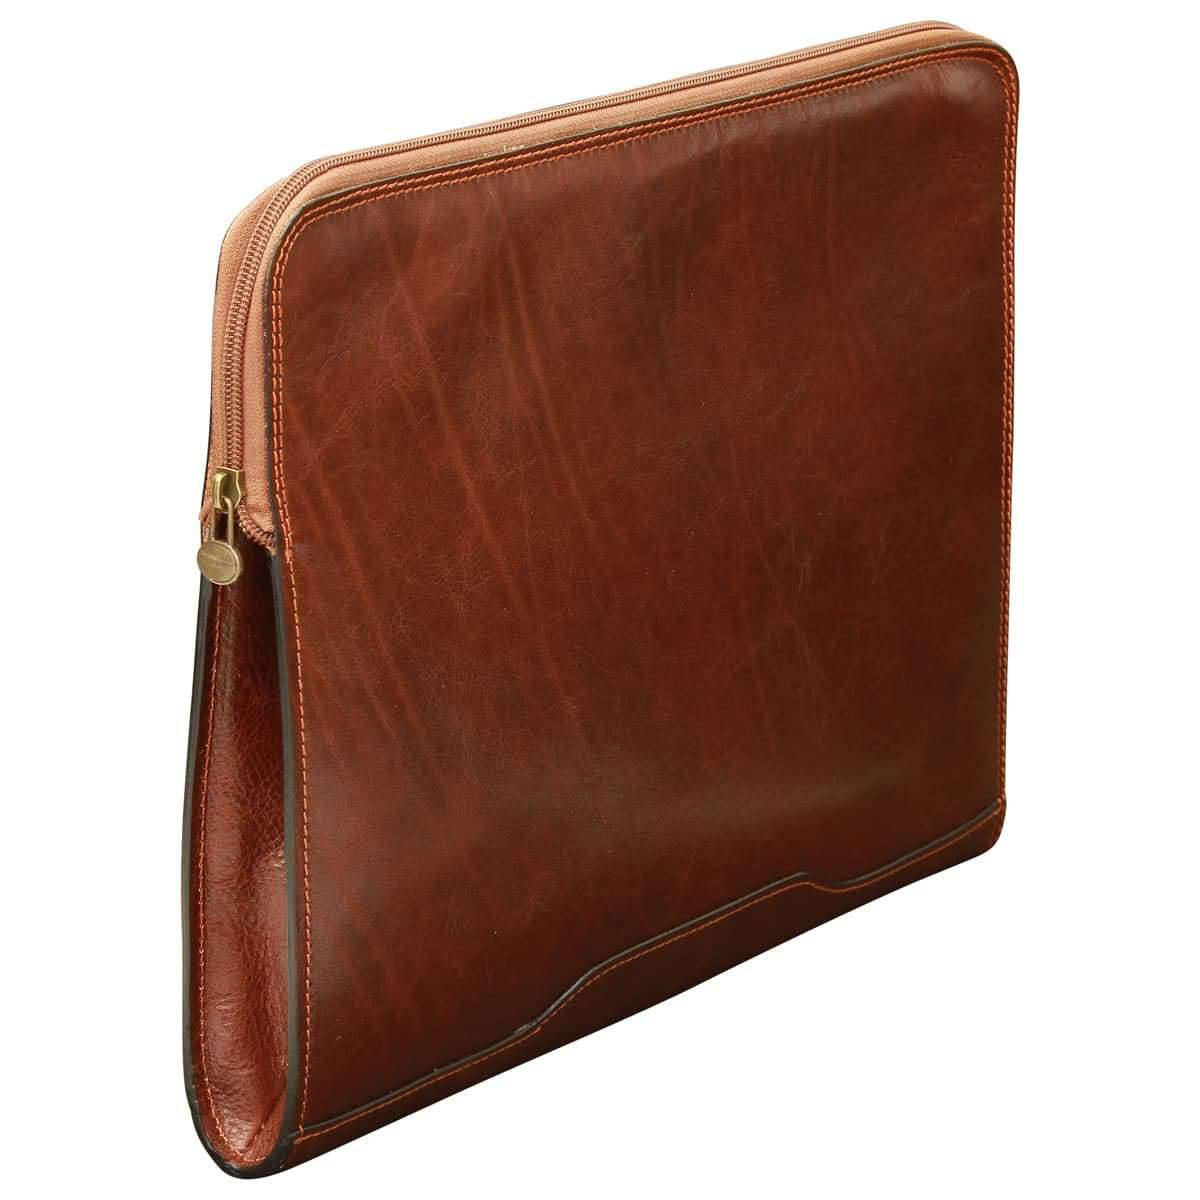 Leather Portfolio - Brown